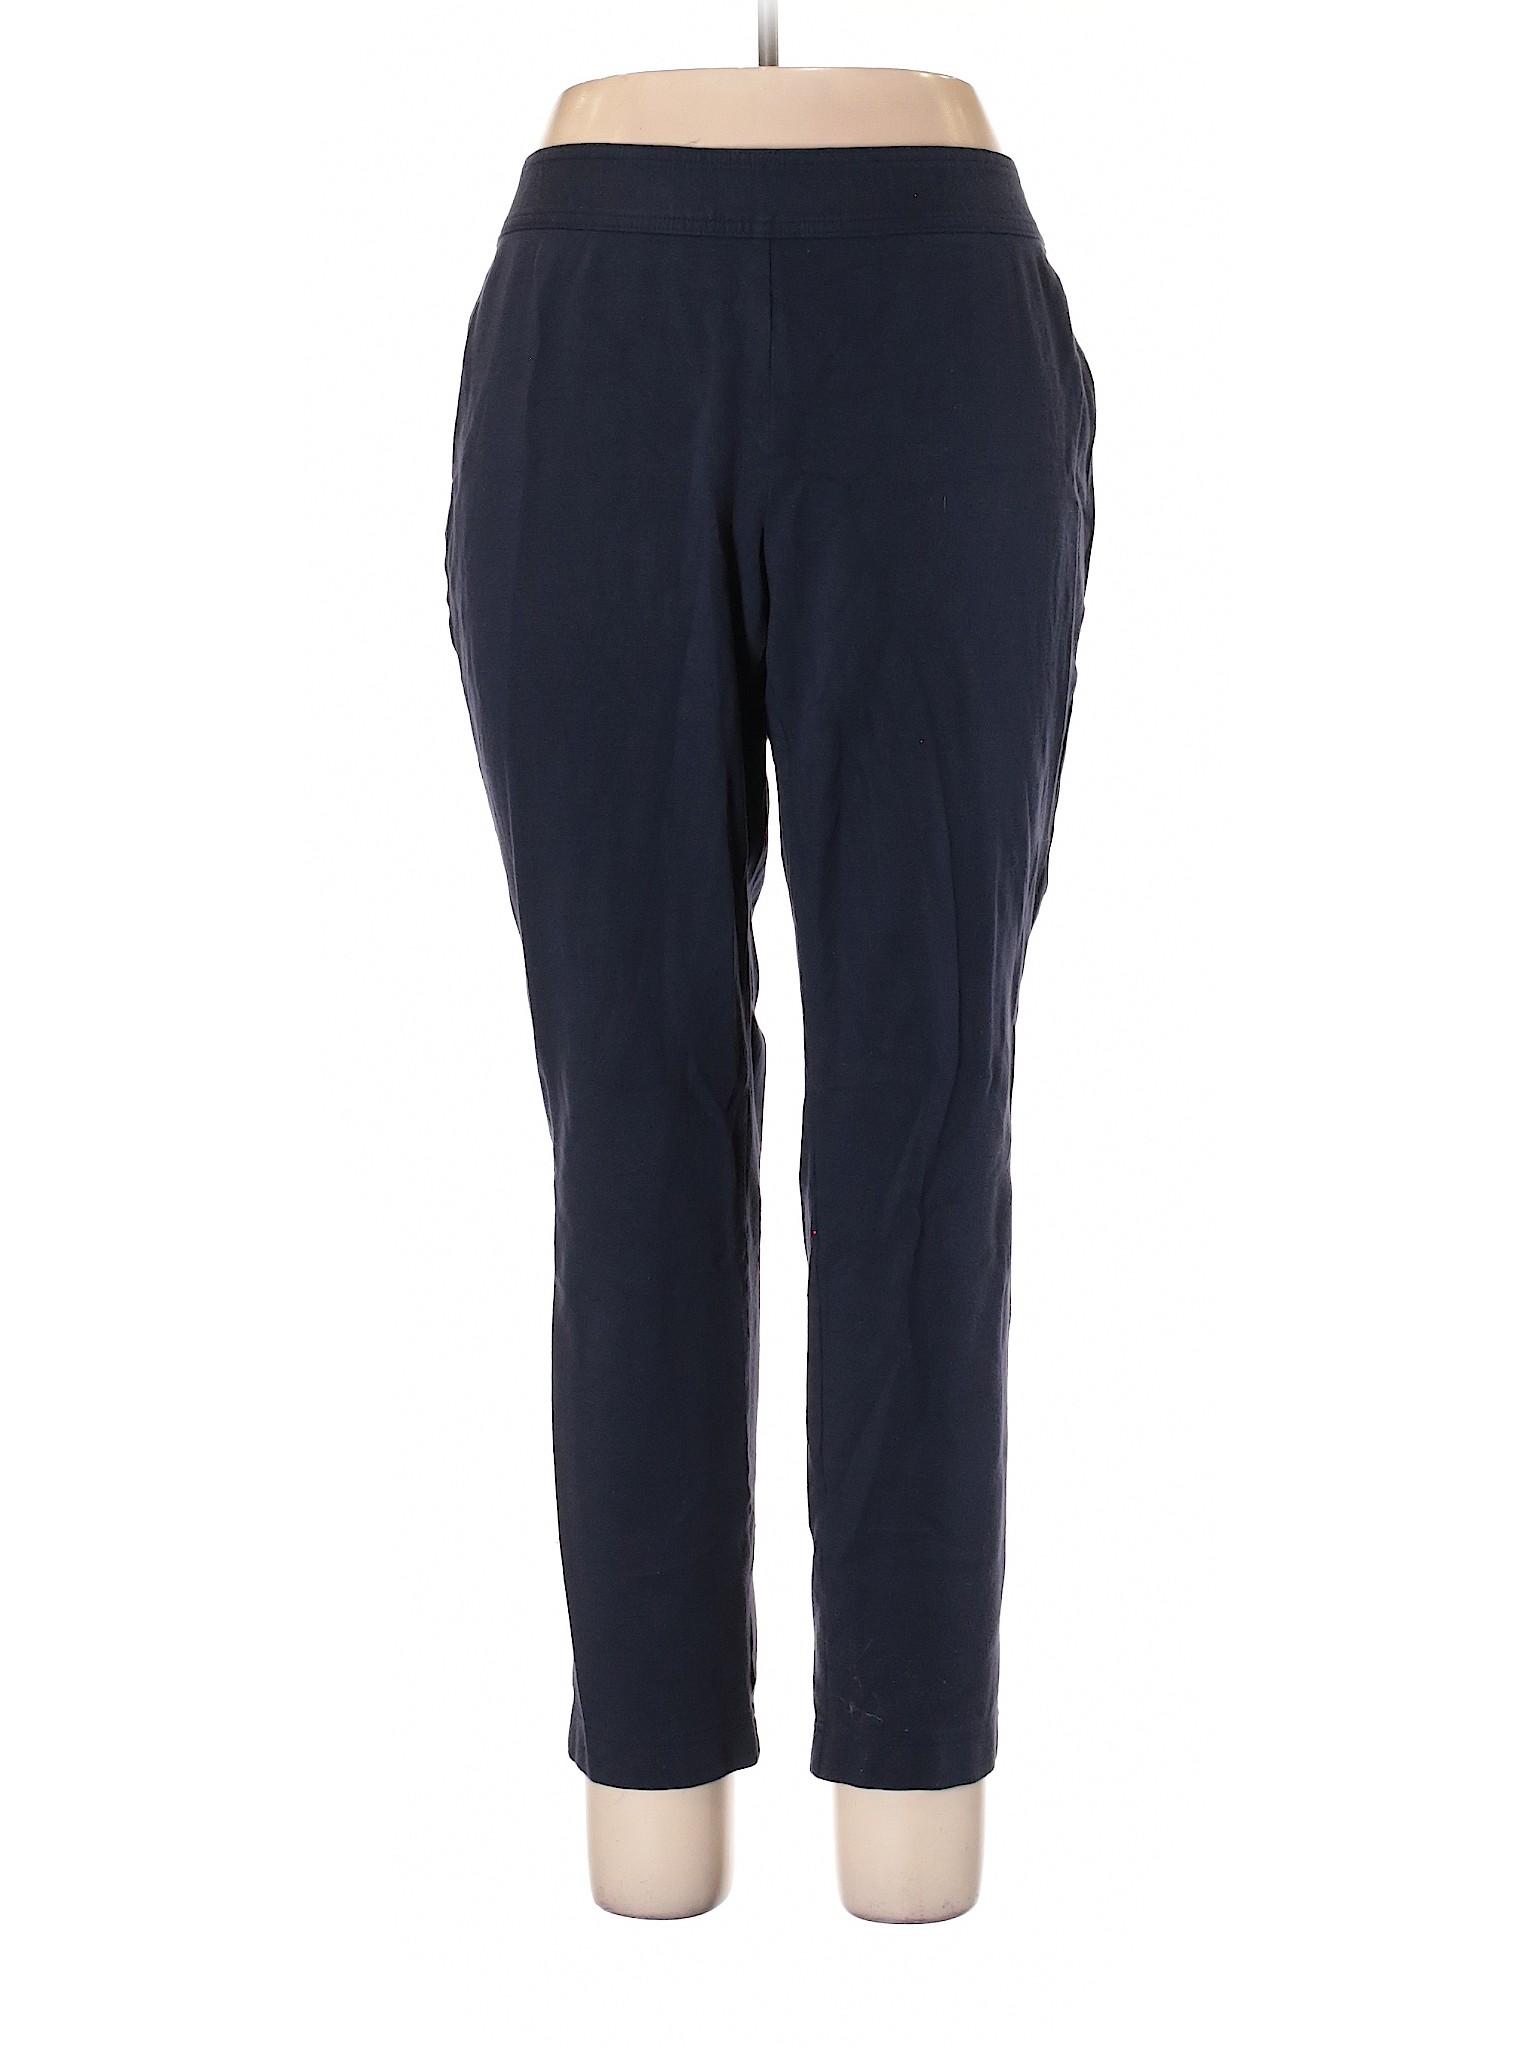 Boutique Concepts INC International Leggings winter aX4rqa